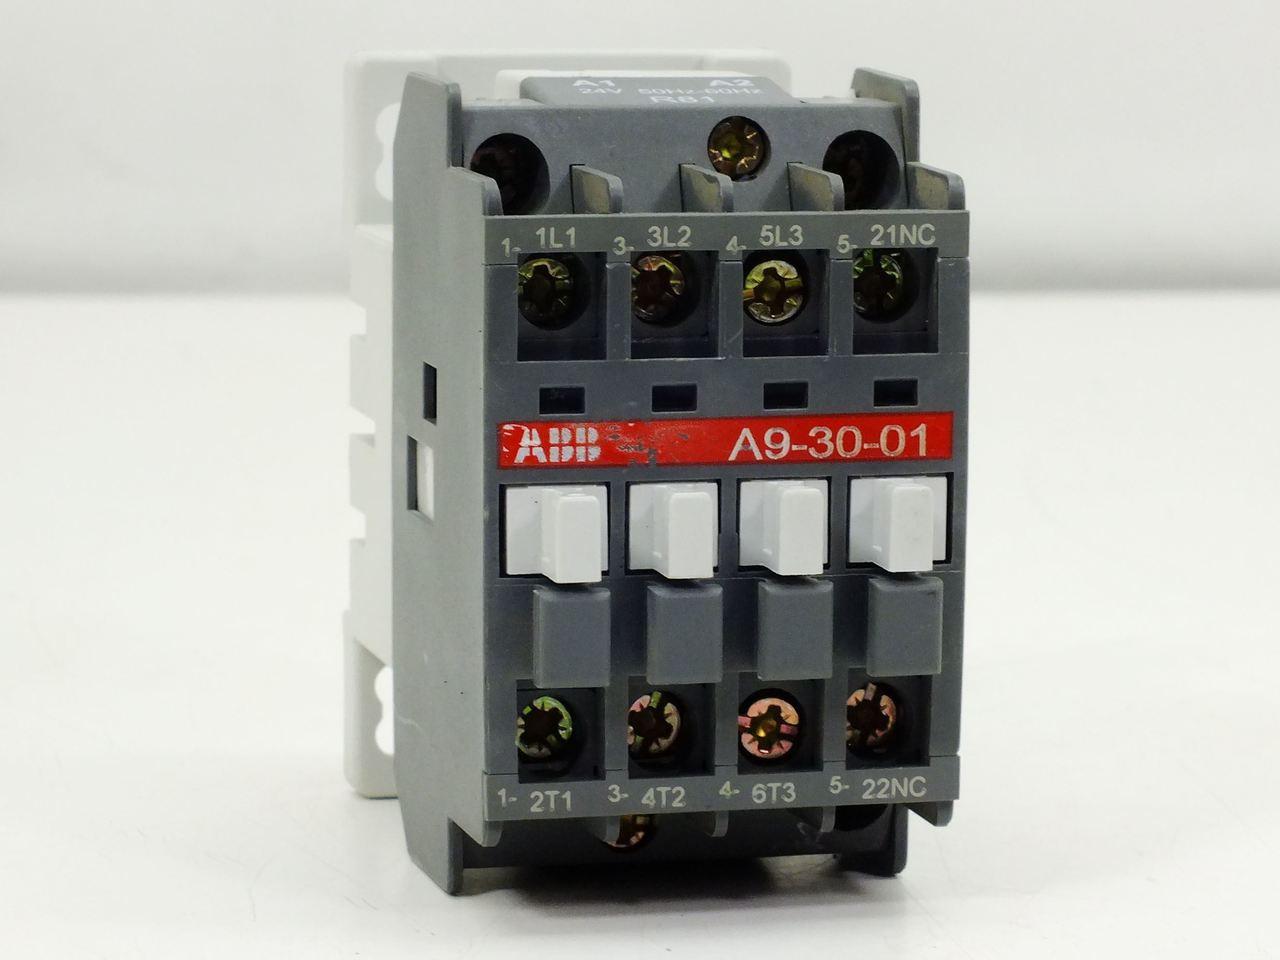 Abb A9 30 01 Contactor Relay 4 Pole 220 230v 50hz 230 240v 60hz 24 Under Current Volt